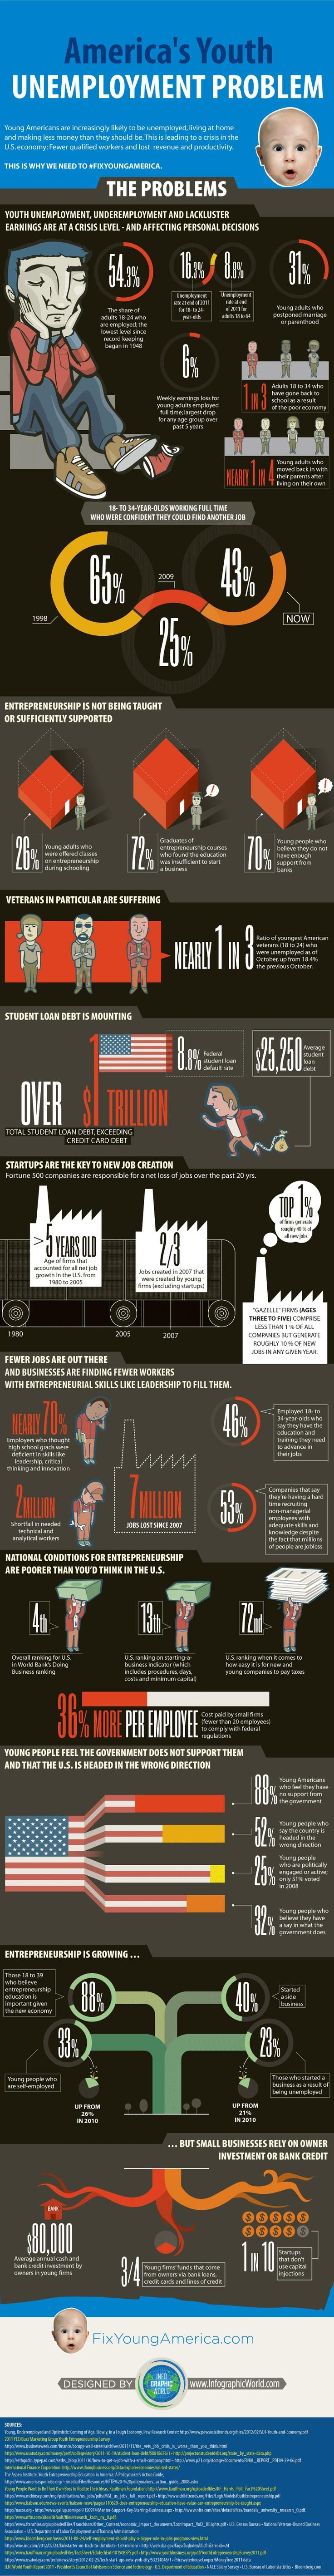 US Youth unemployment.... Crisis